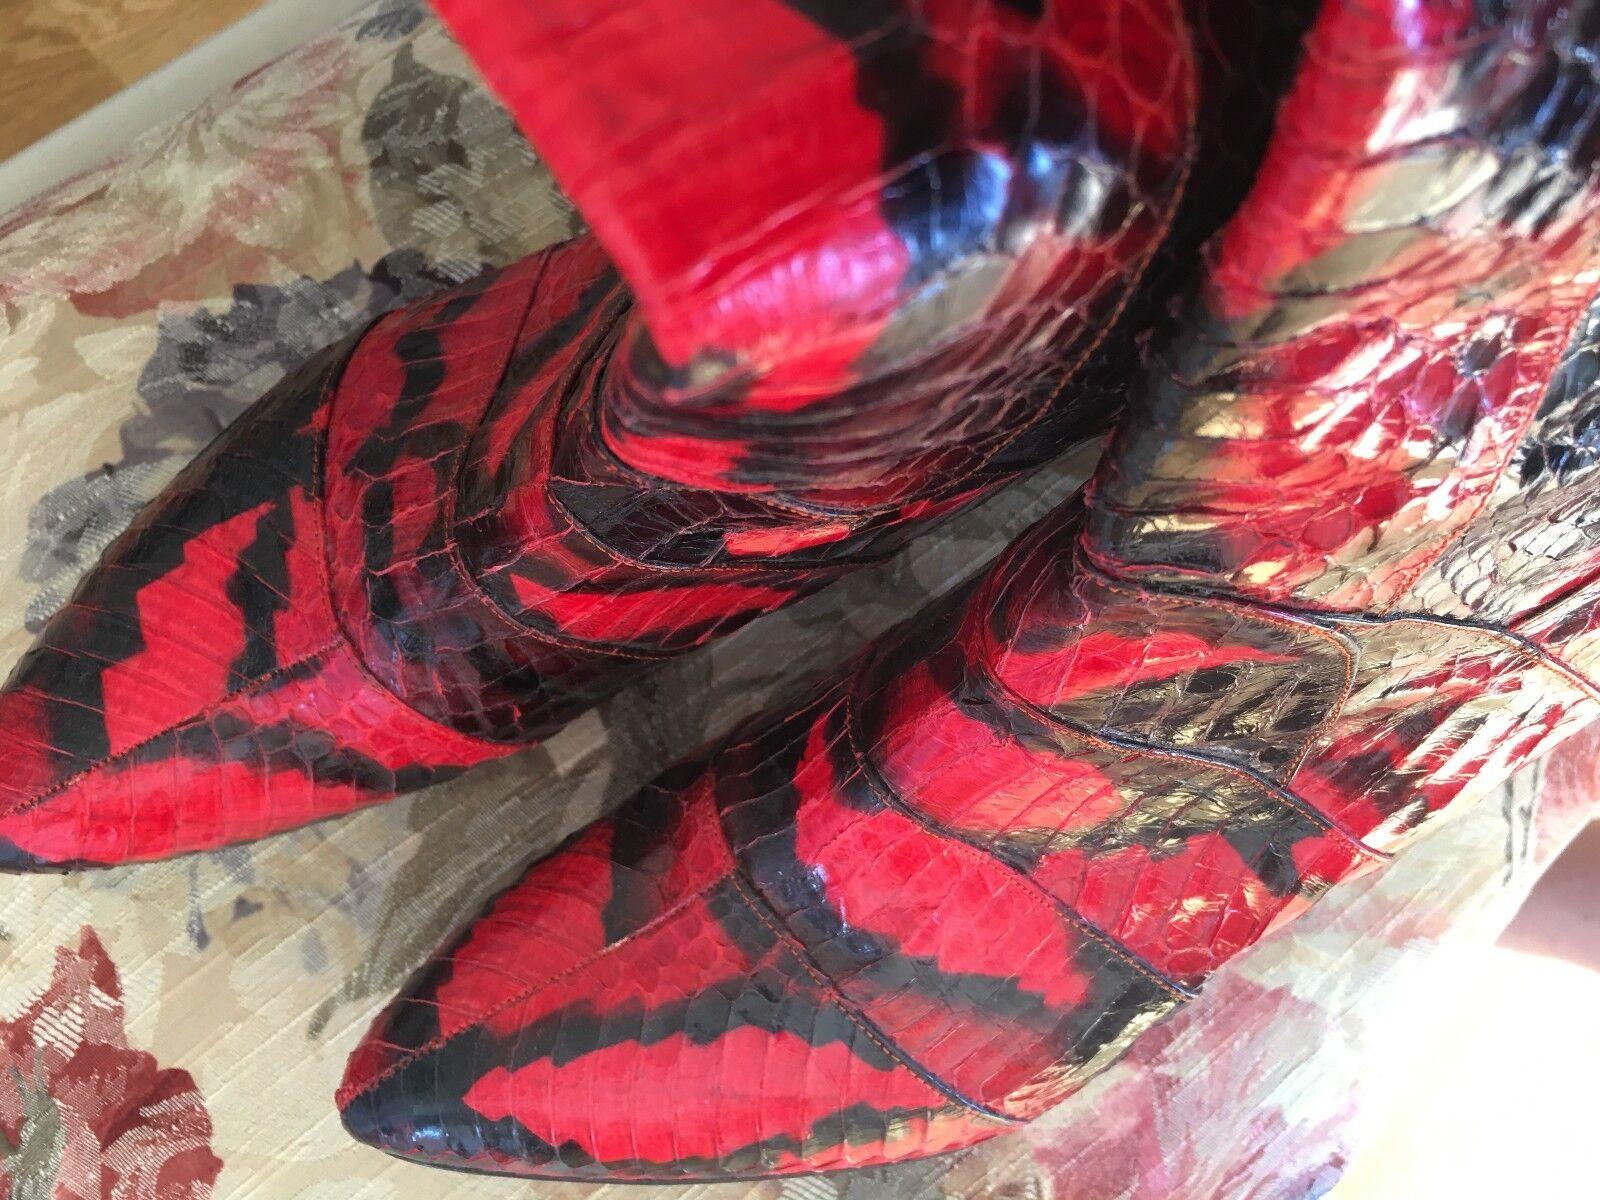 NEW   Genuine Python Skin Boots Size EU 40 UK 7 USA 10